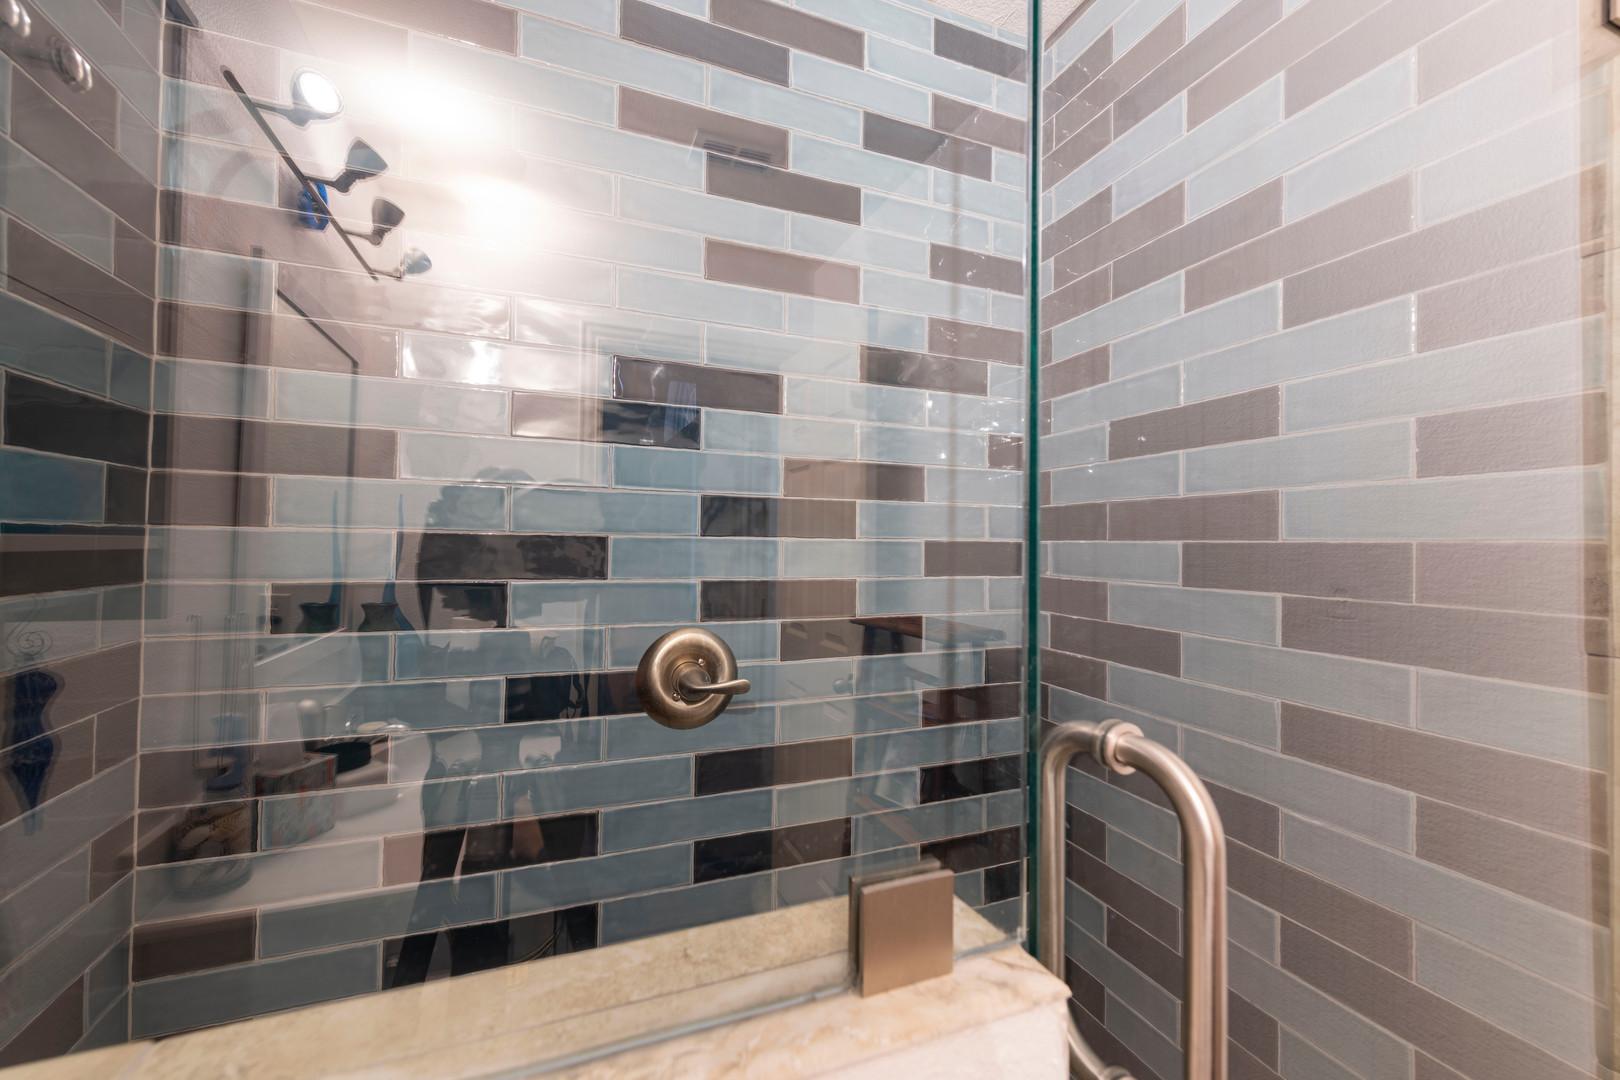 Shower Remodel with Blue Tile